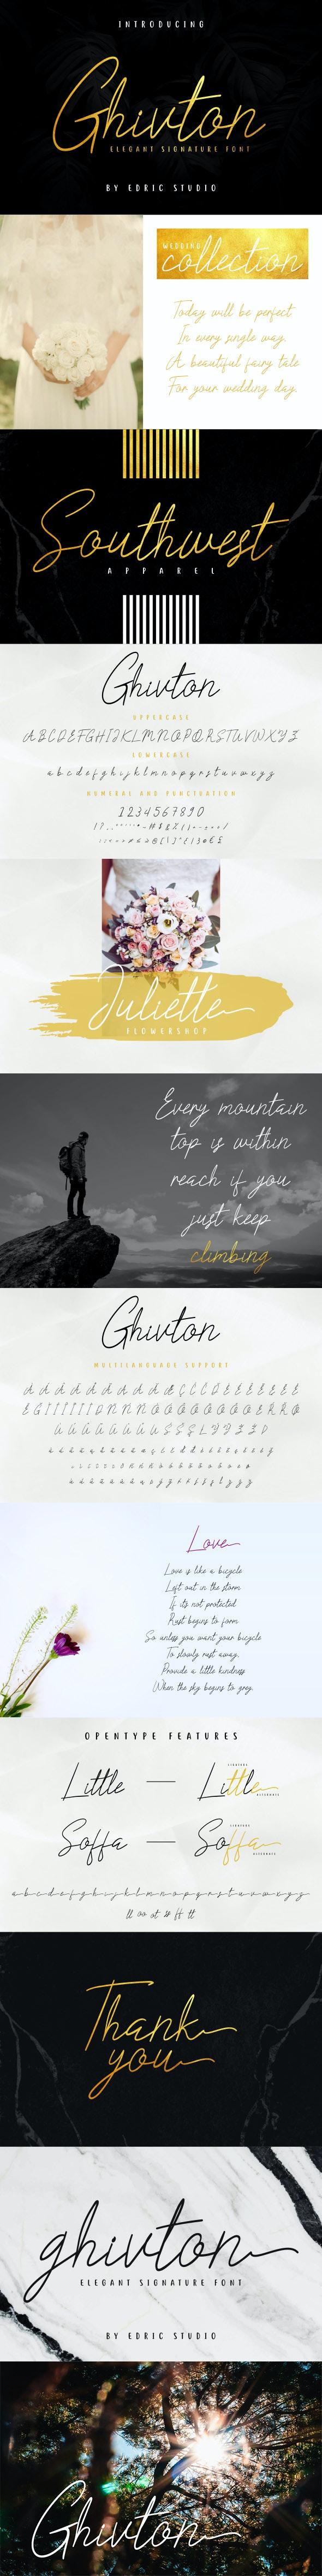 Ghivton Signature Font - Handwriting Fonts